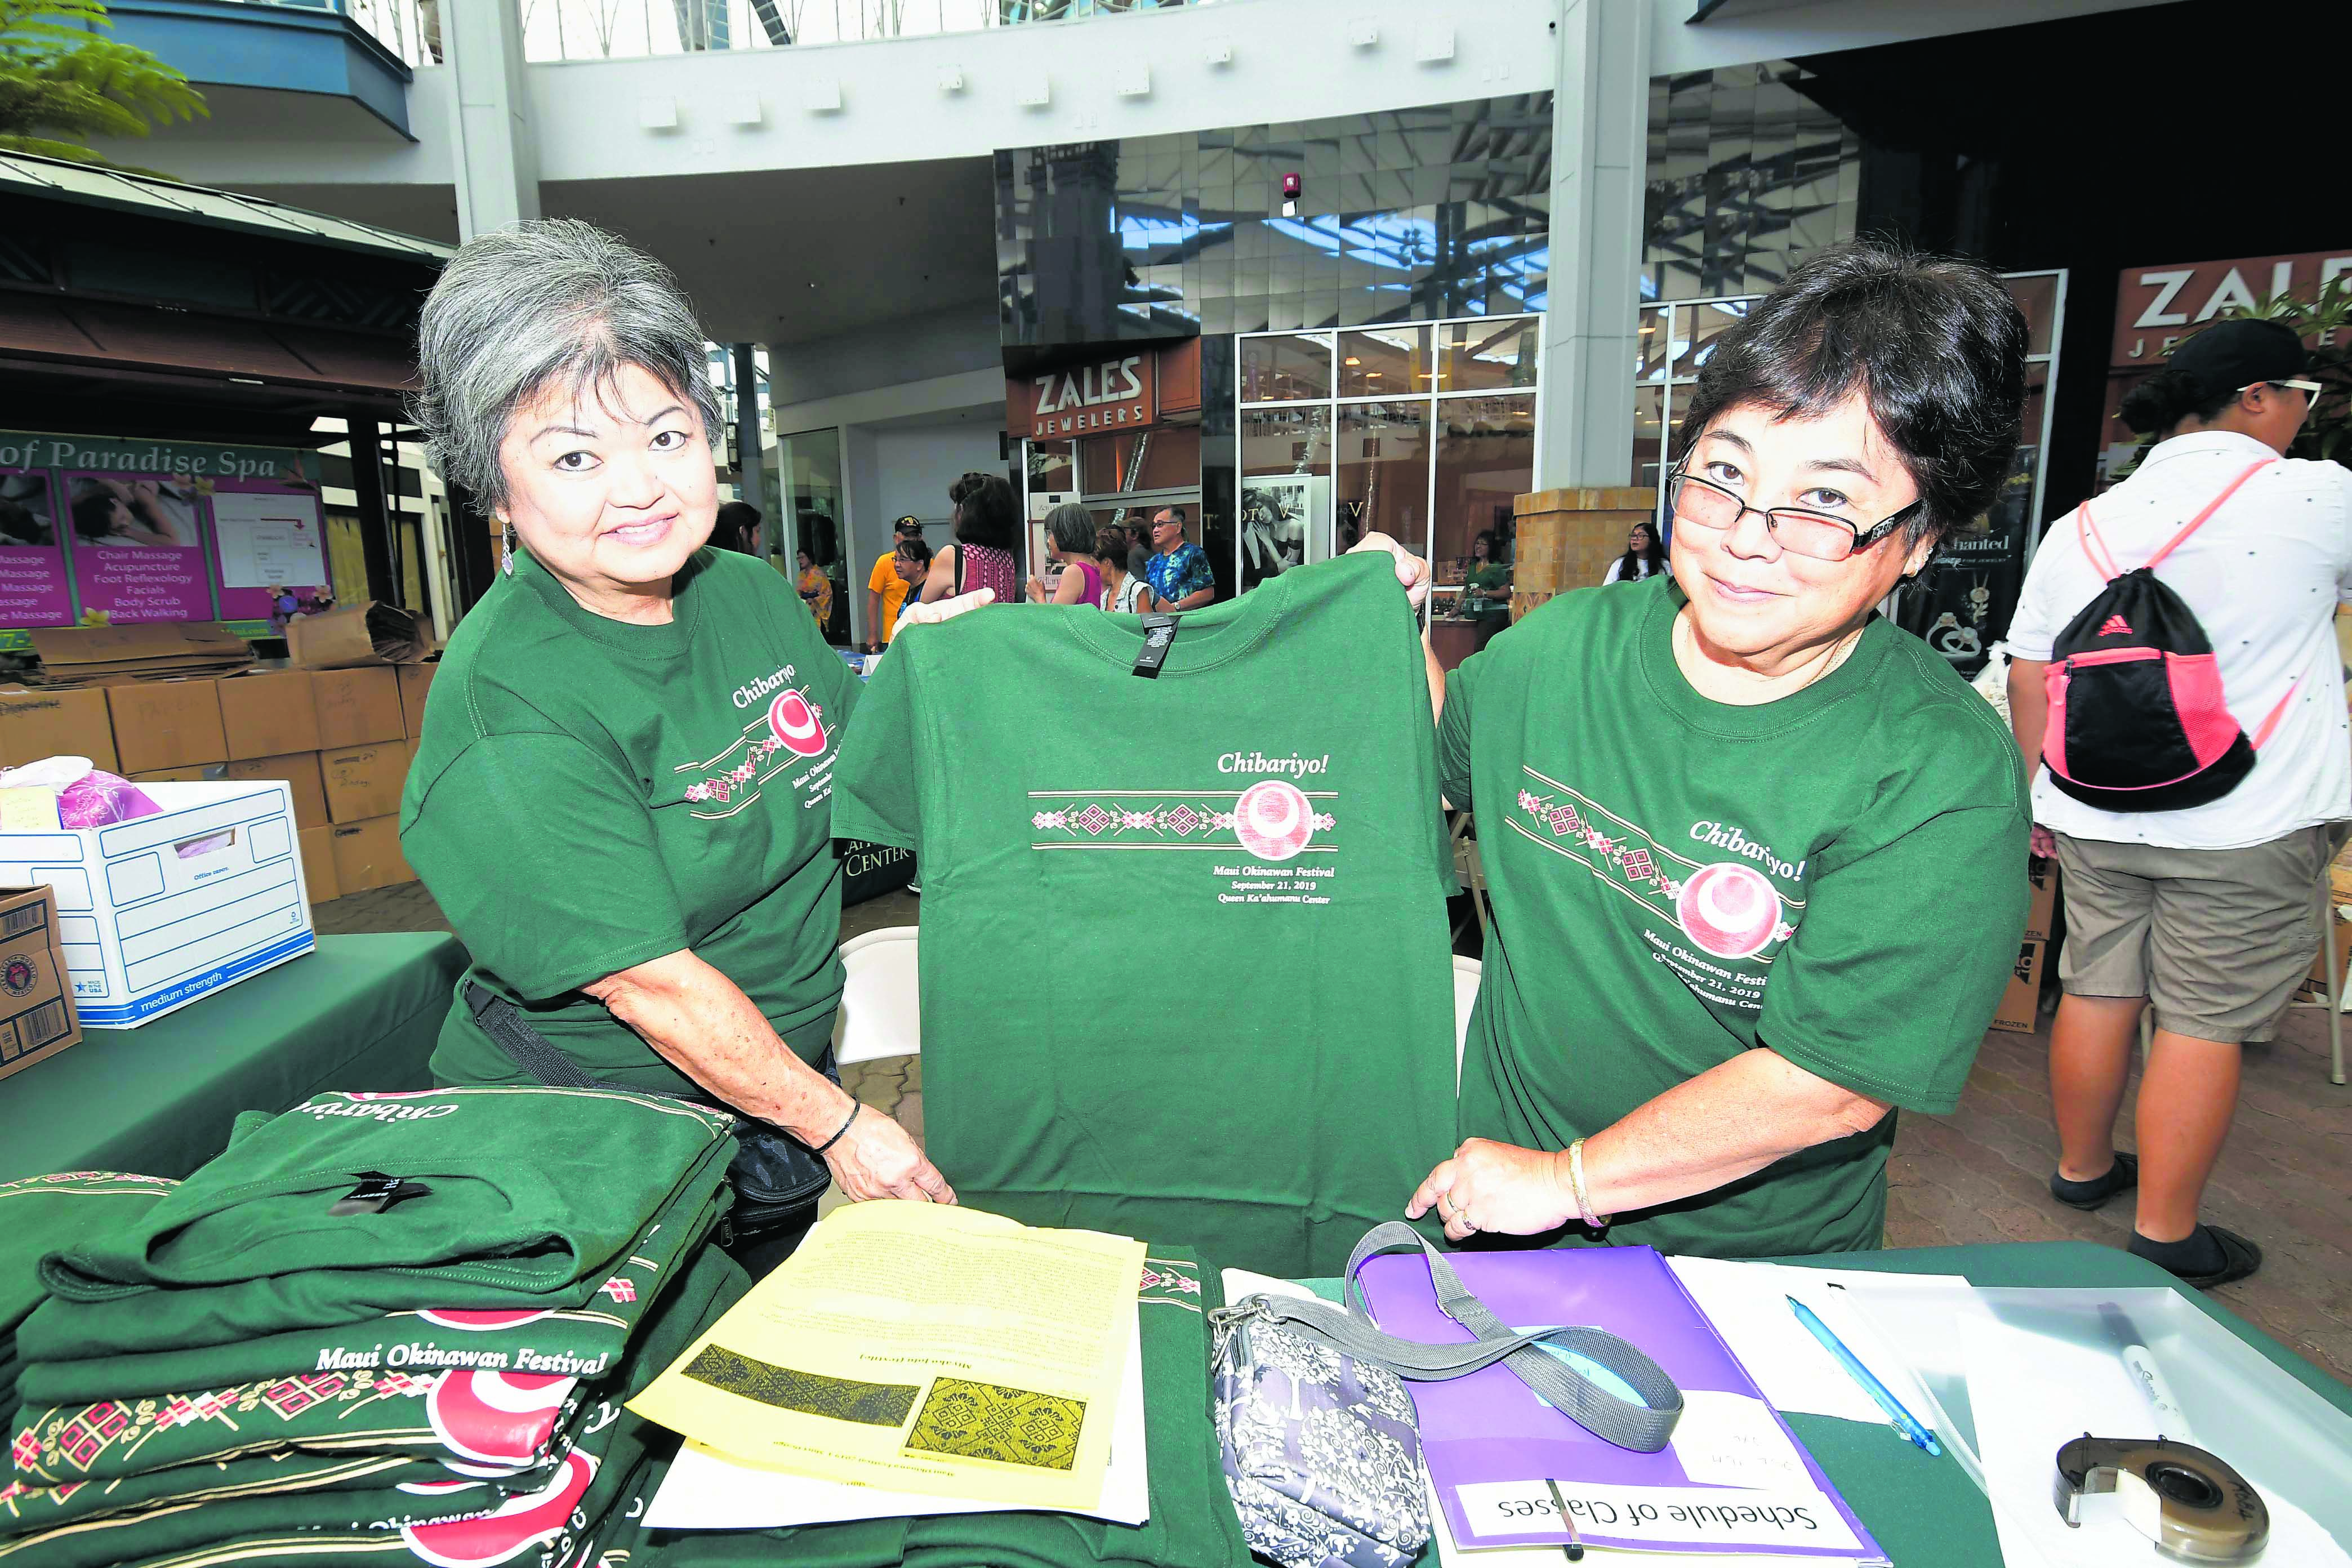 Maui Okinawa Kenjin Kai members Amy Yamada (left) and Eileen Kobayashi were busy selling Festival T-shirts.